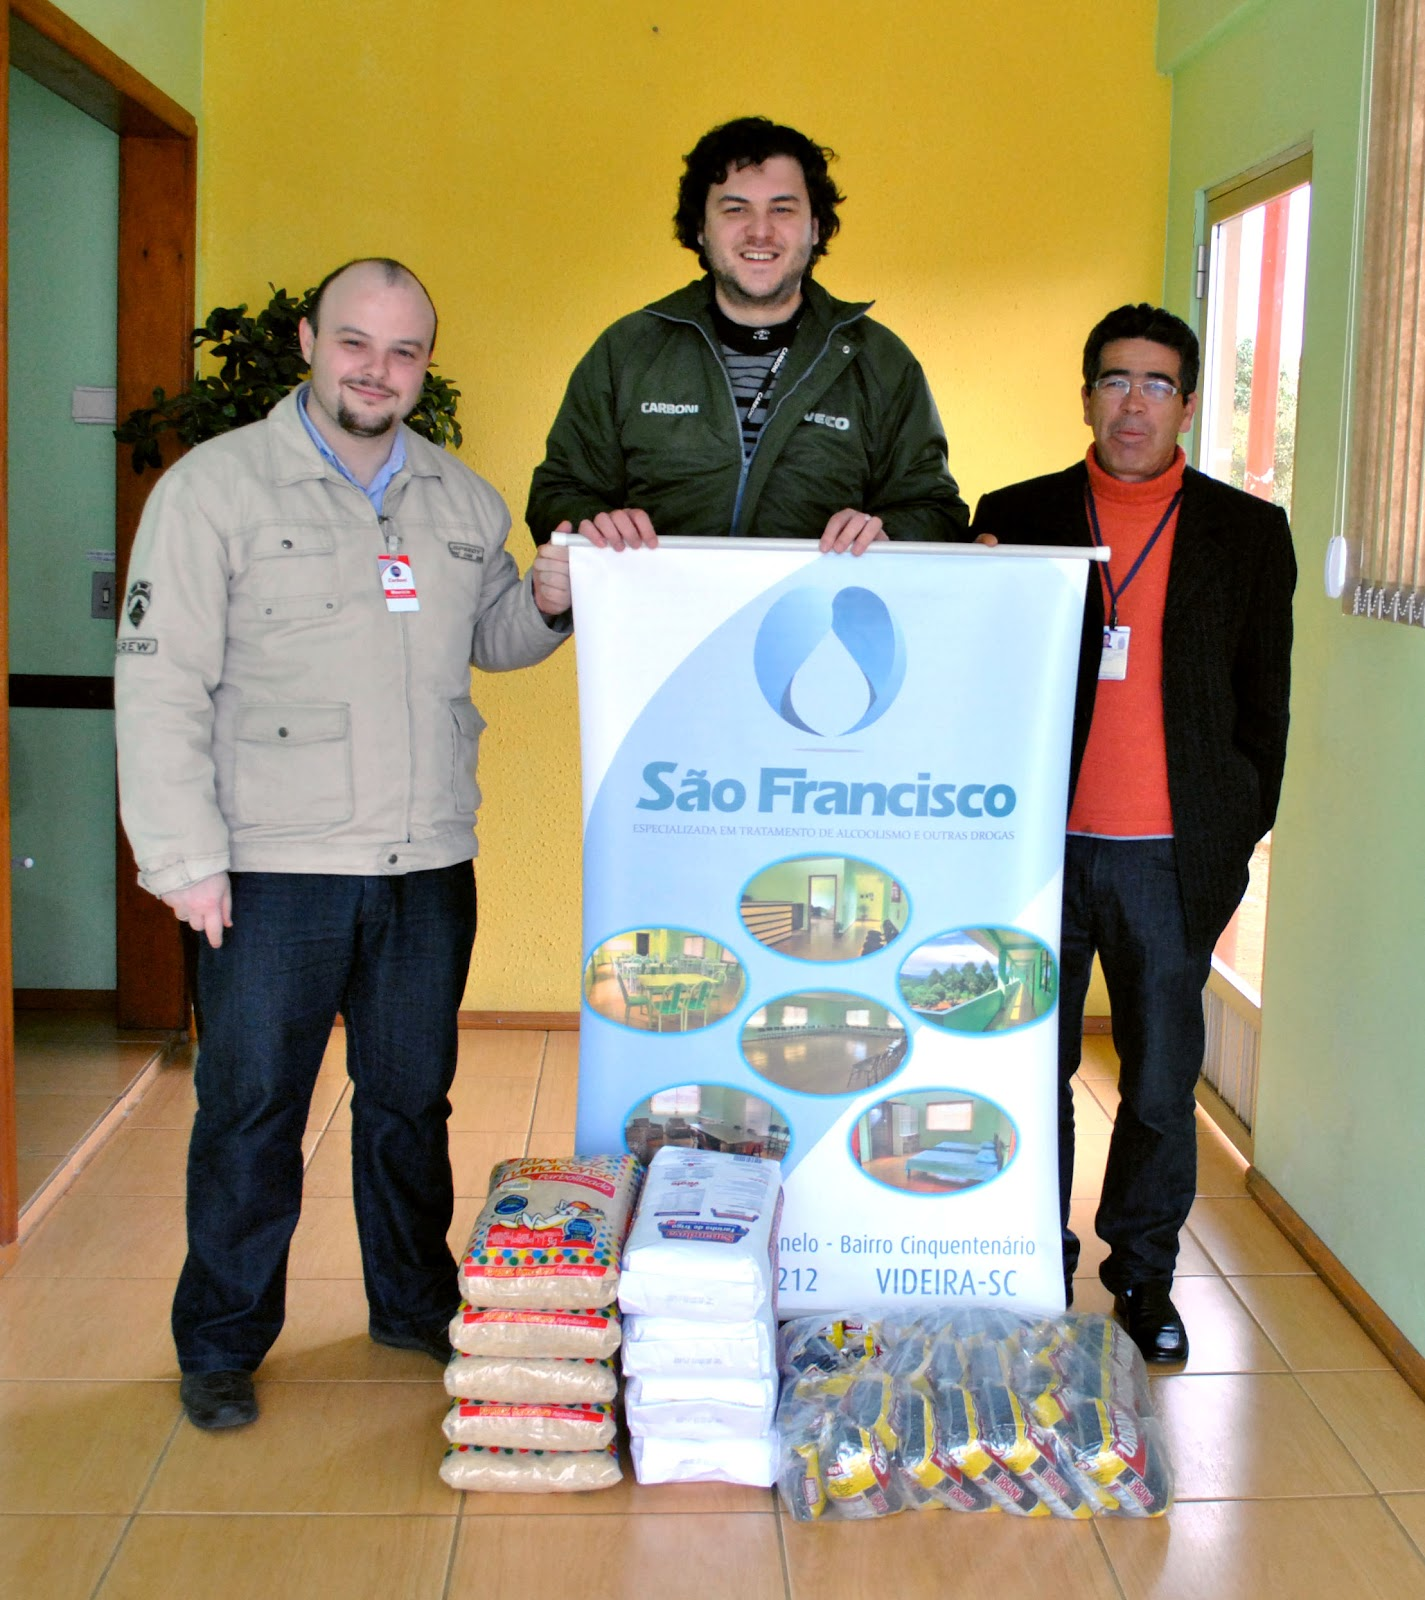 Carboni Fiat entrega mais de 70 quilos de alimentos à CT São Francisco DSC 0004